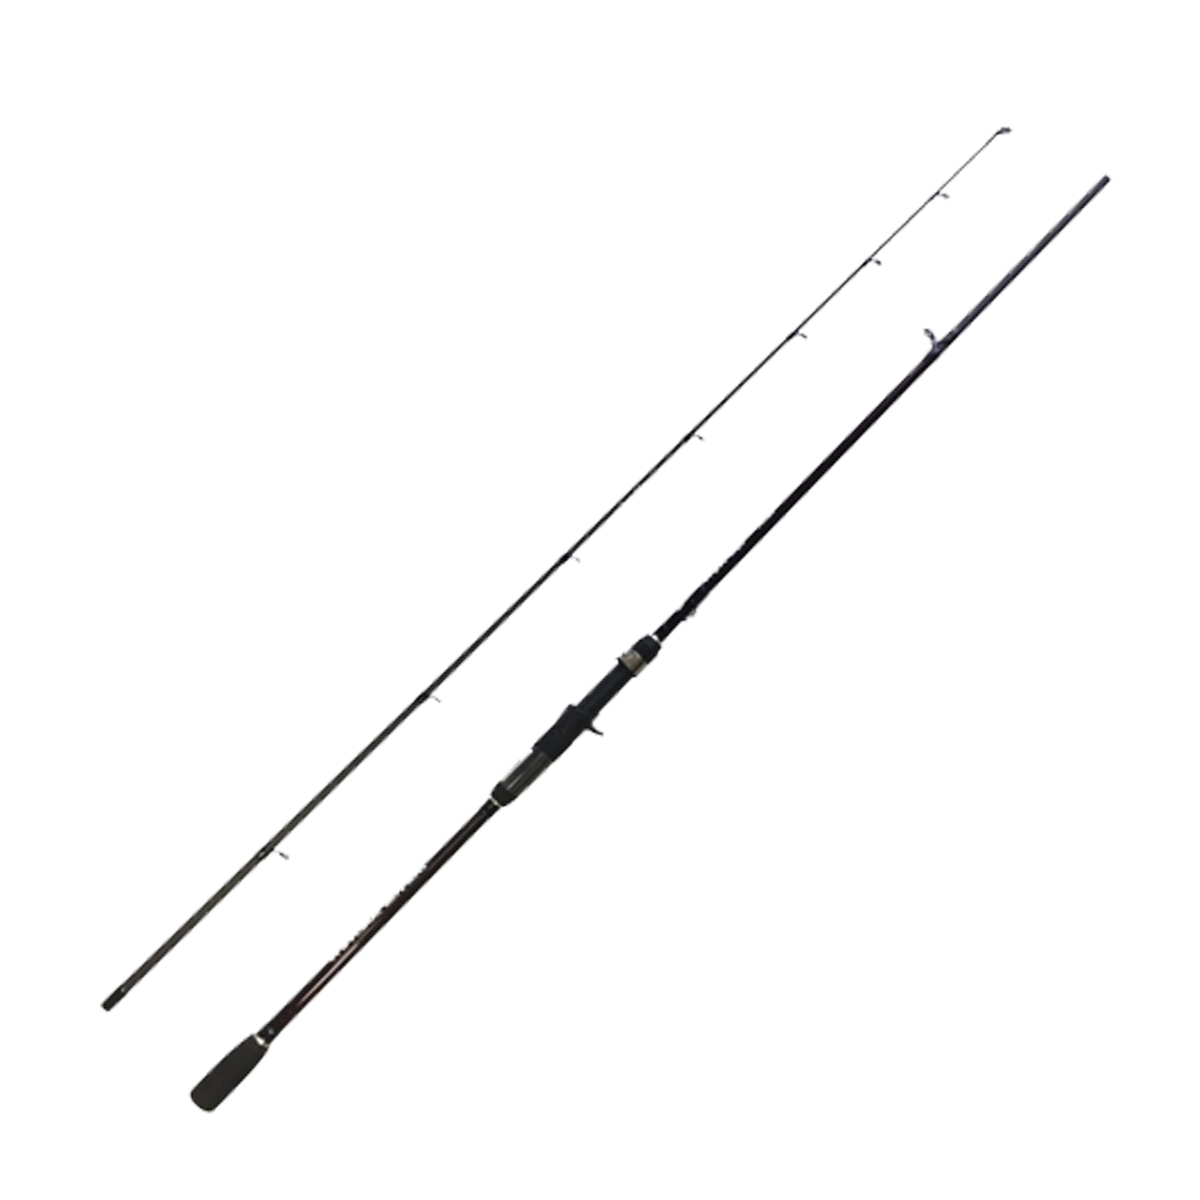 Vara Albatroz Albacora p/ Carretilha 2,70 m 50 lbs (2 partes)